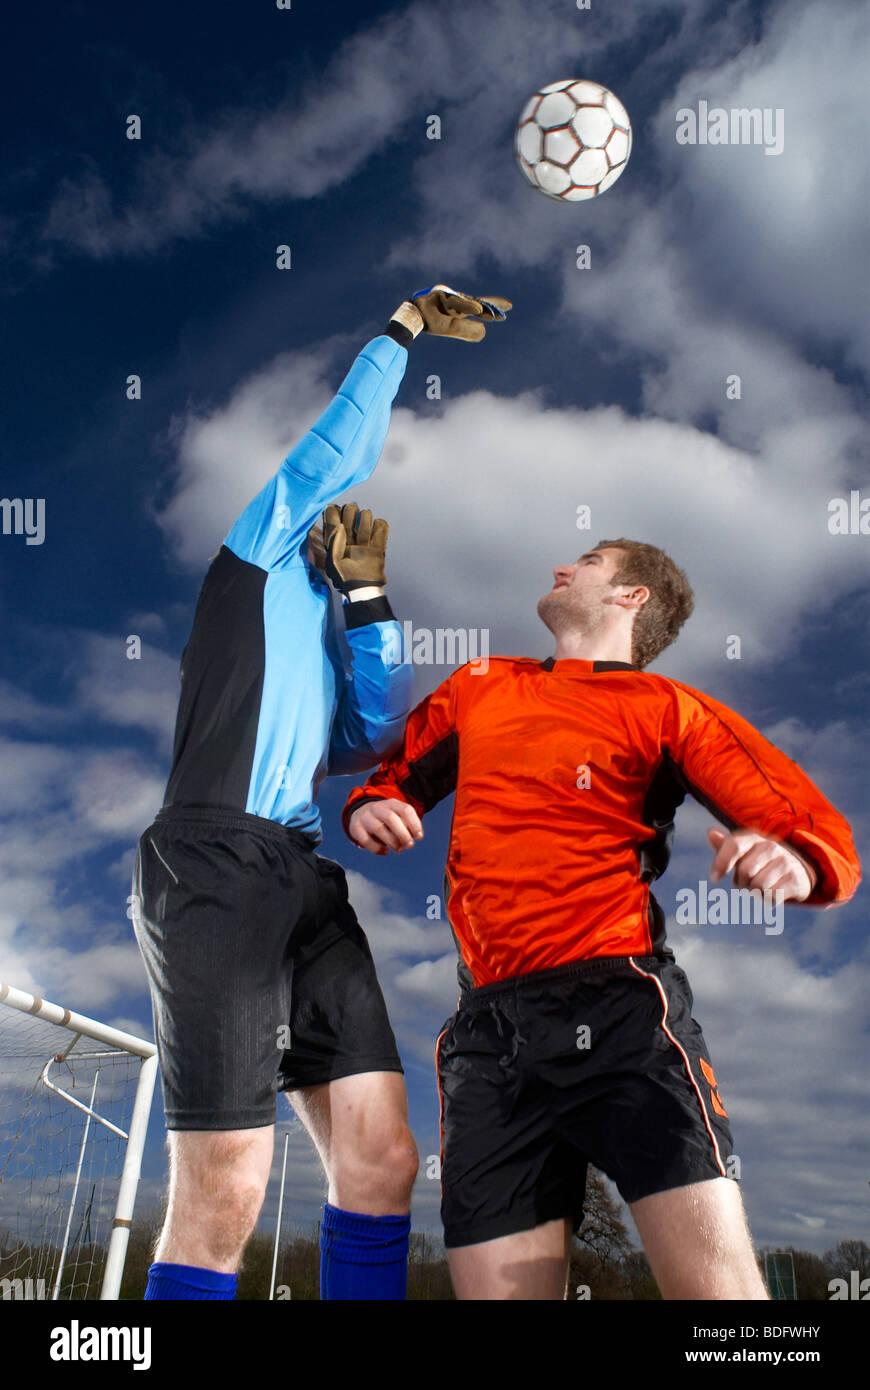 goalkeeper punching ball - Stock Image